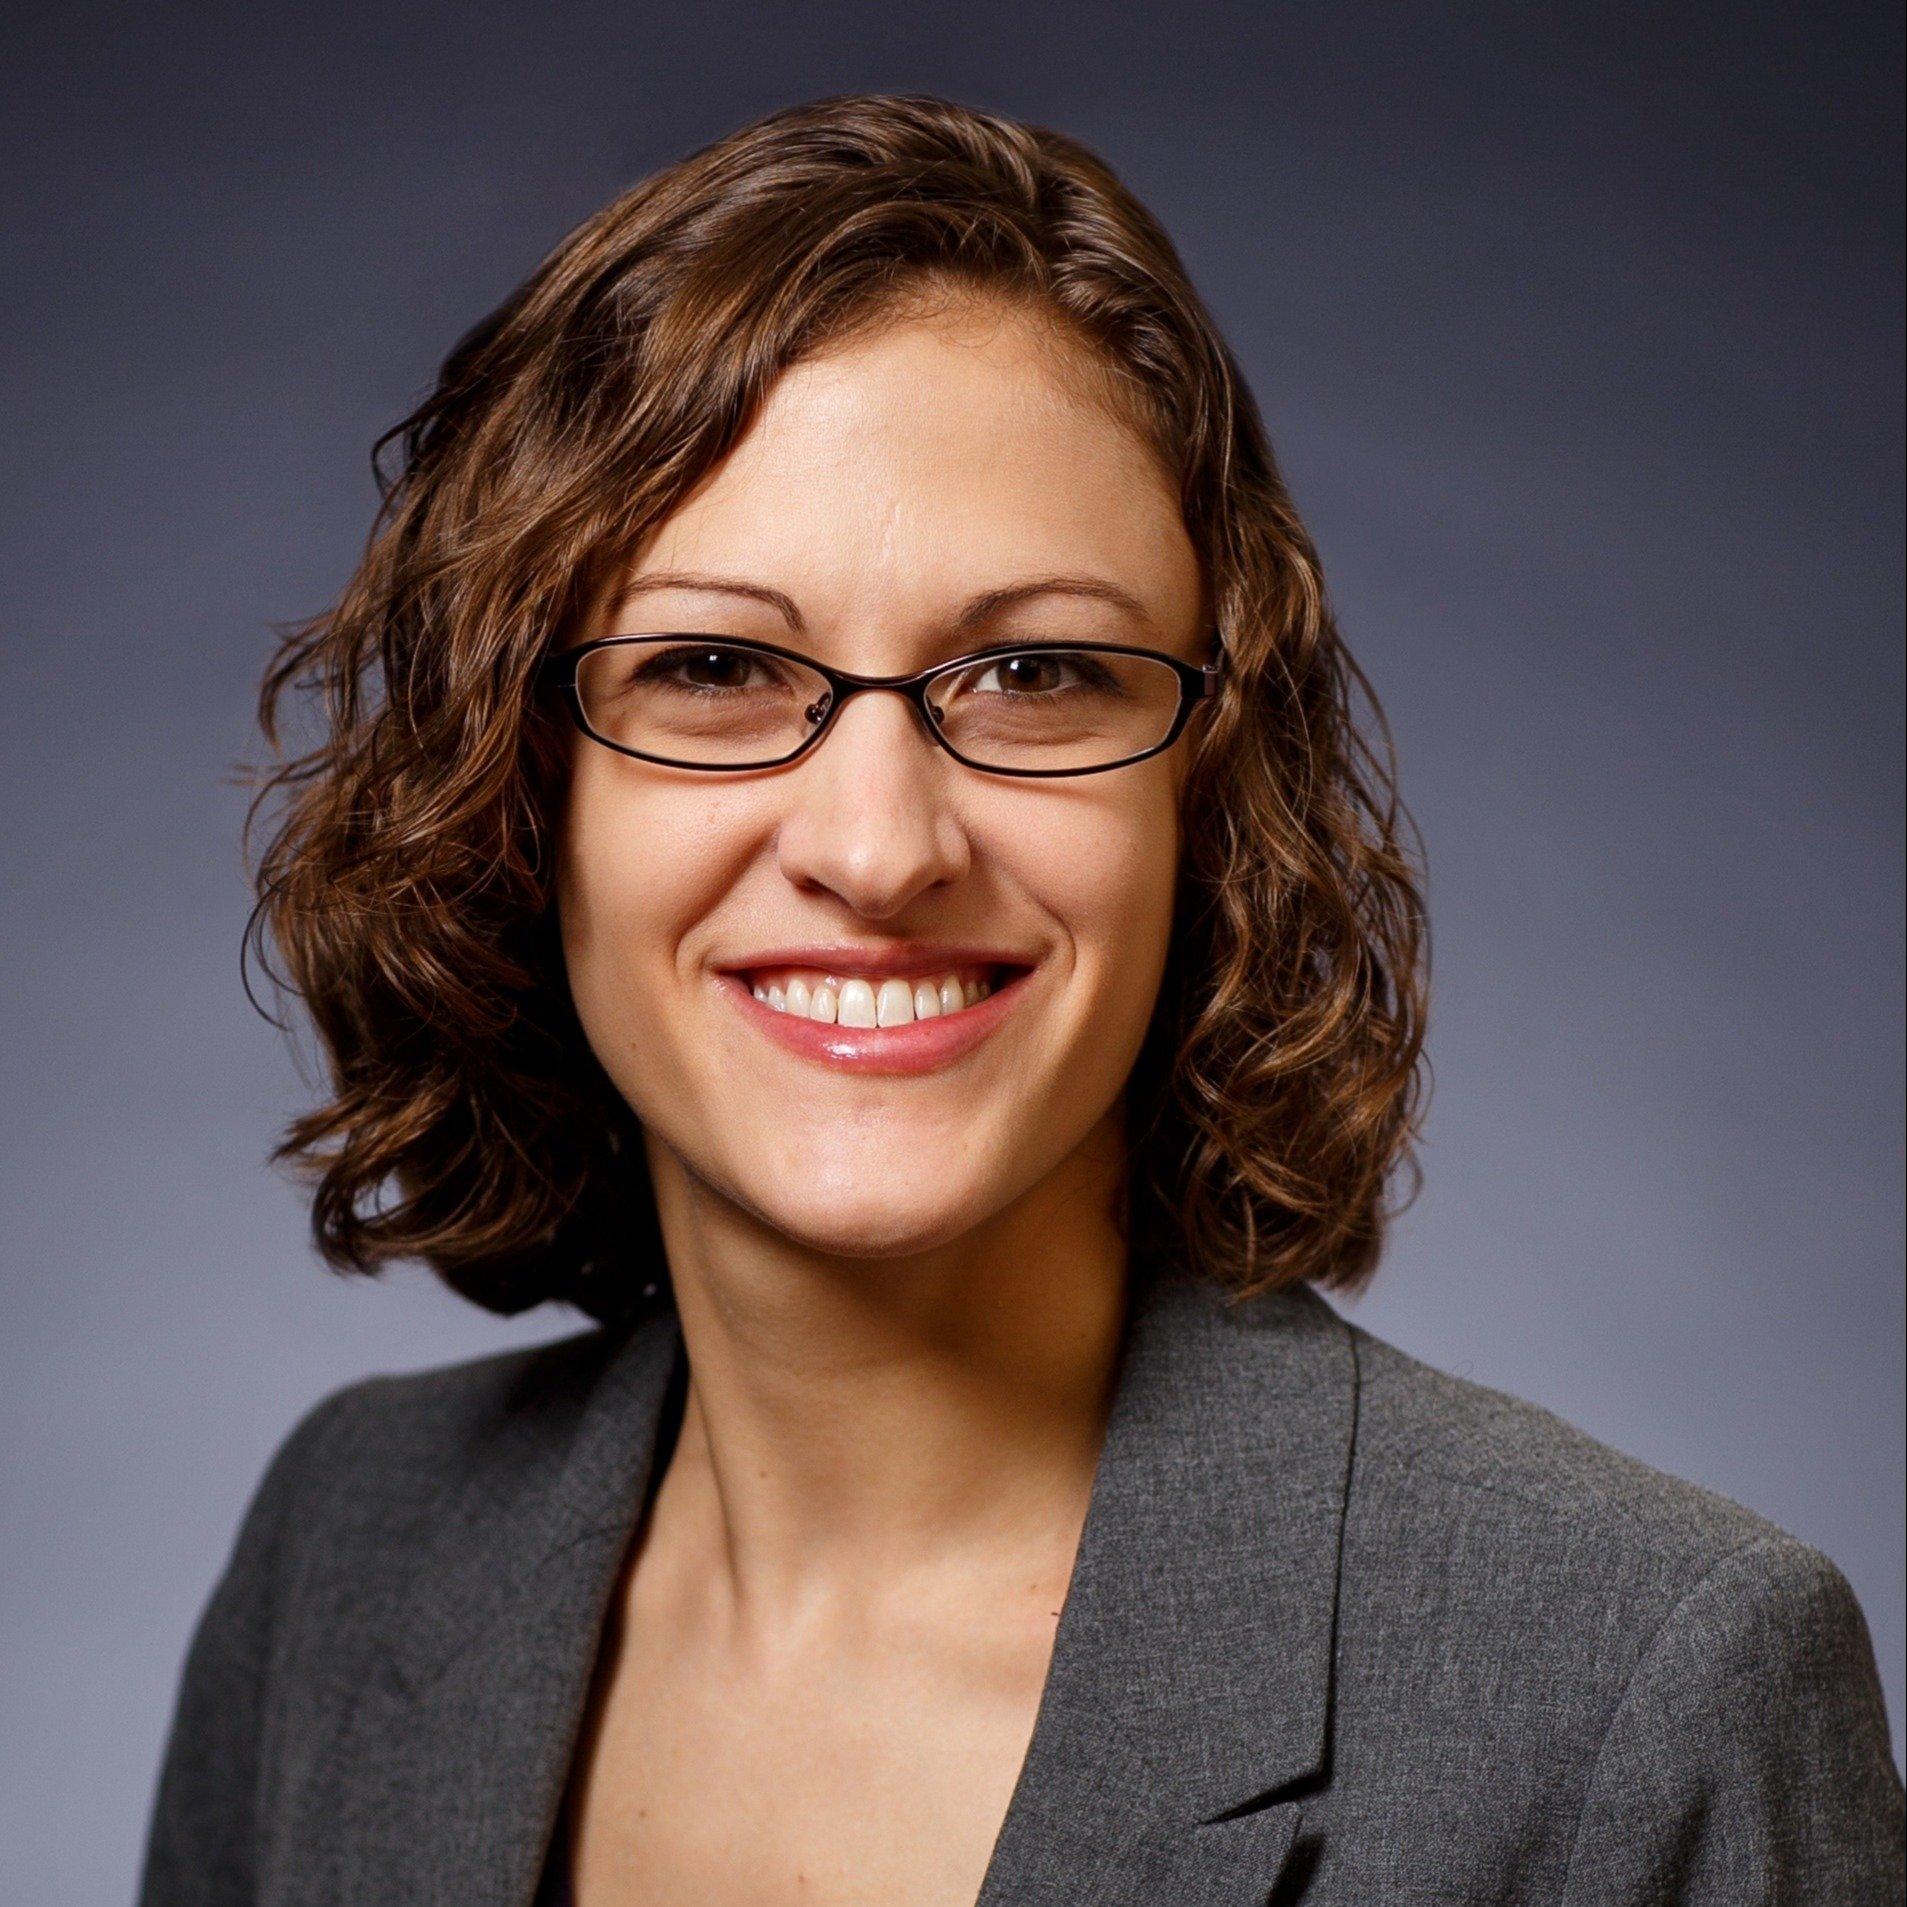 Karen R. Shenk, CPA, CVA, CCIFP, CFE